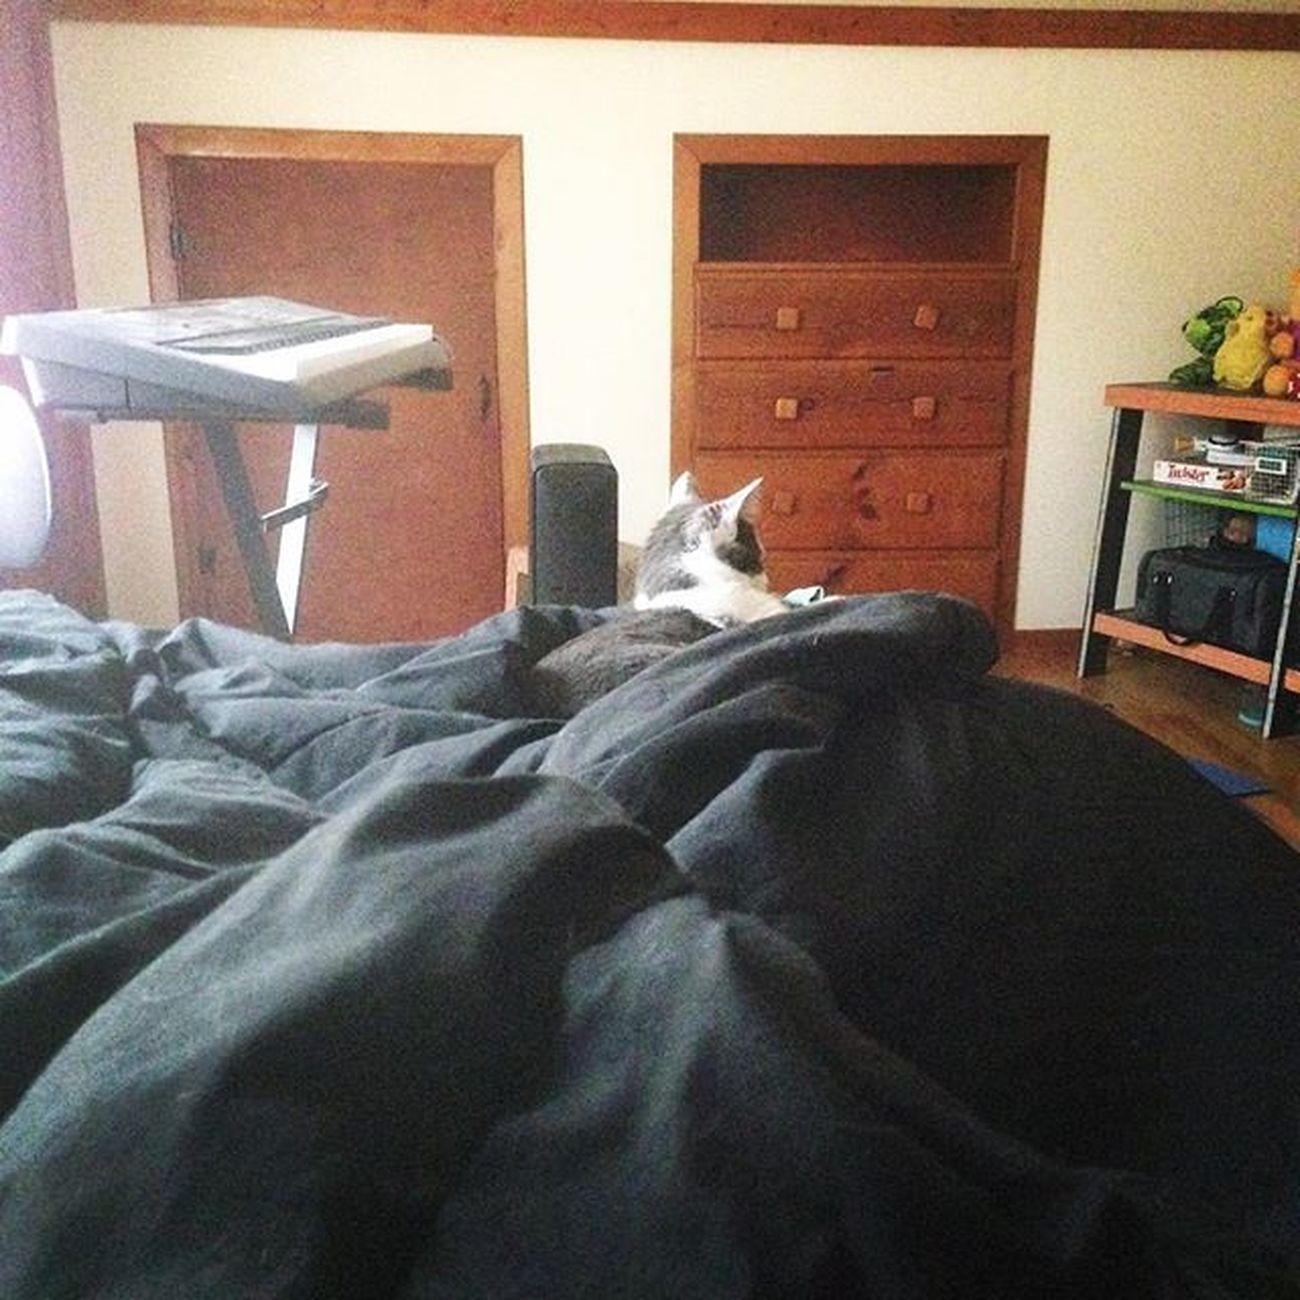 We're sick. Sick Sickday Sickness Sickaf Sickbaby Sicklife Imsick TooSick Kitten Kitty Cat Kittensofinstagram Catsofinstagram Petsofinstagram Tuesdaymorning Tuesday Sicktuesday